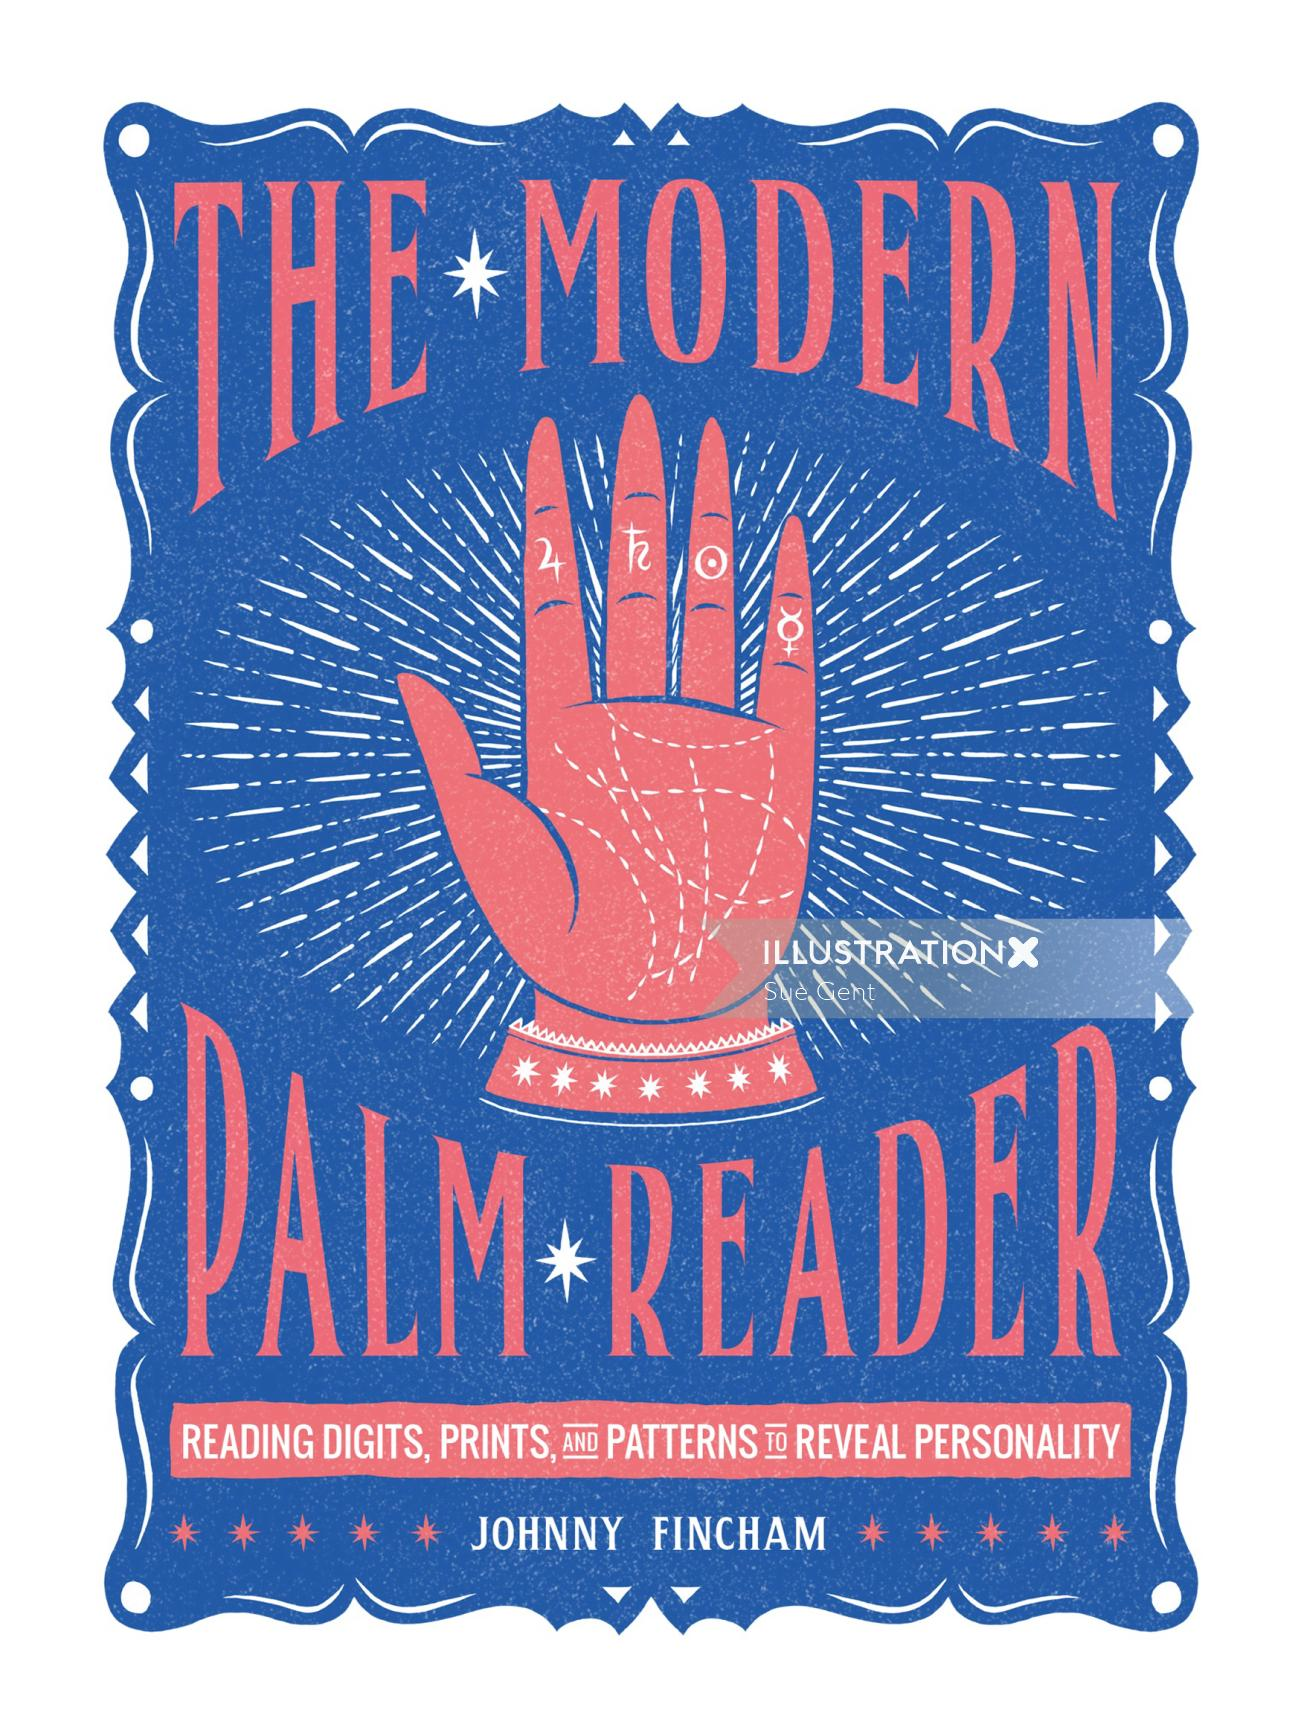 Book Cover design of A modern palm reader